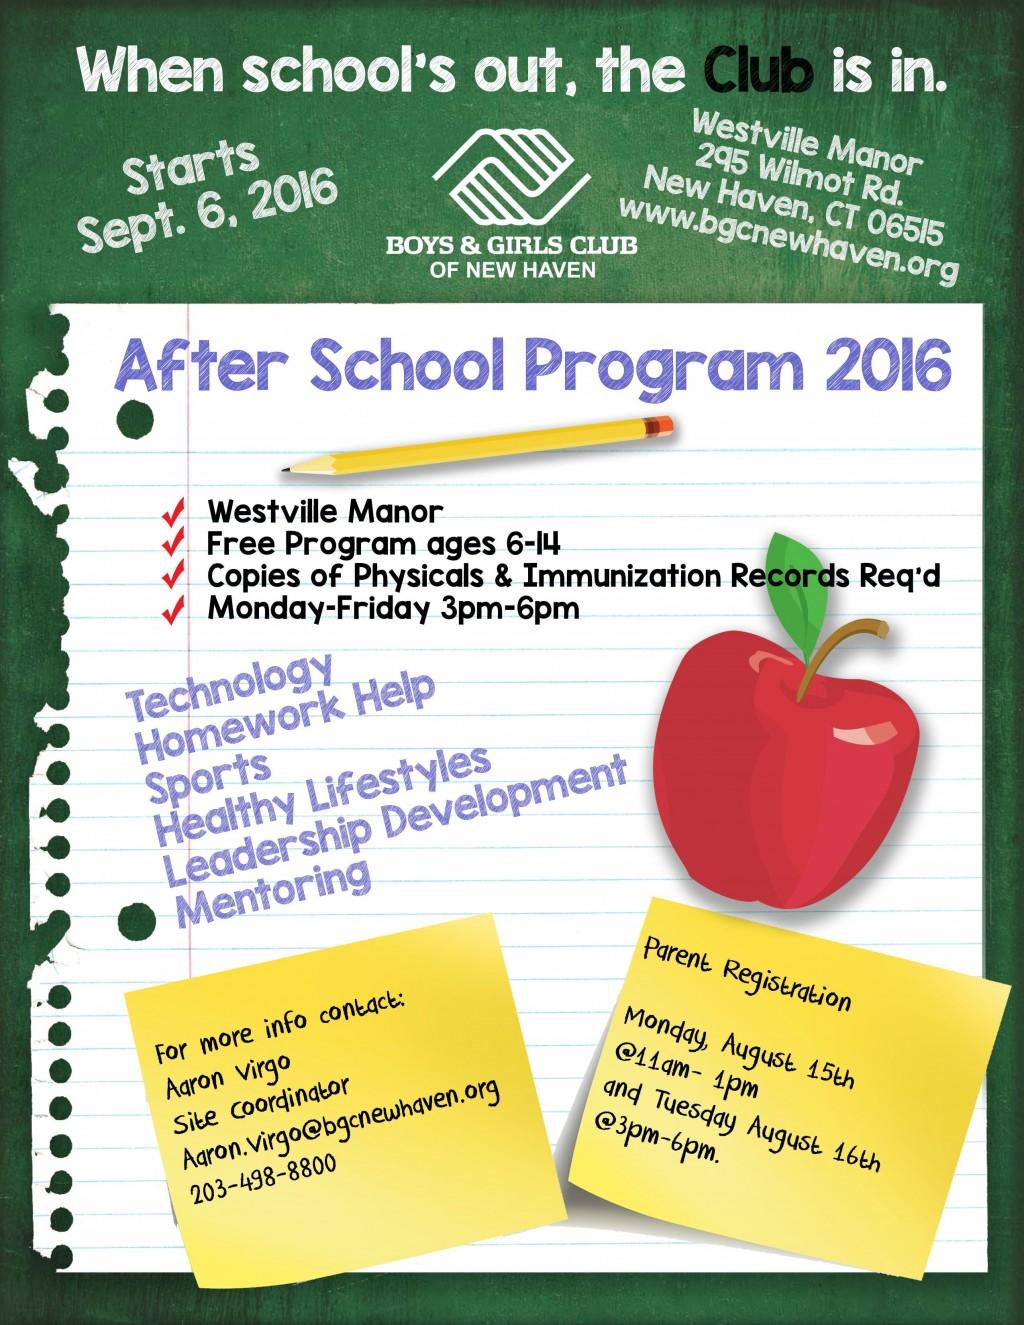 001 Stirring Free After School Program Flyer Template Concept Large